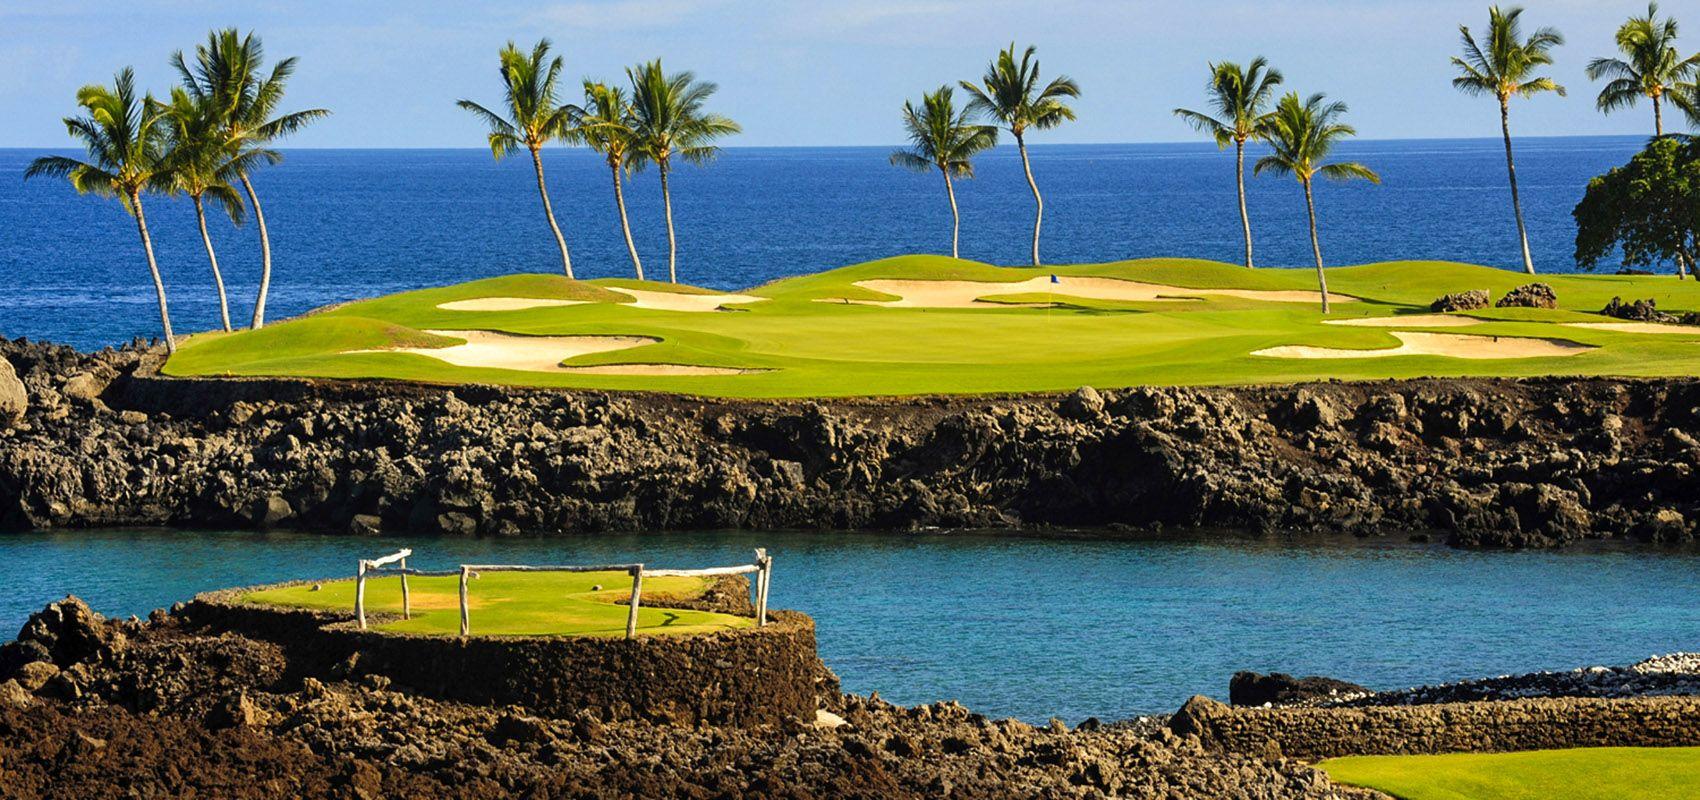 Island Hawaii Hotels Resorts Mauna Lani Bay Hotel Bungalows